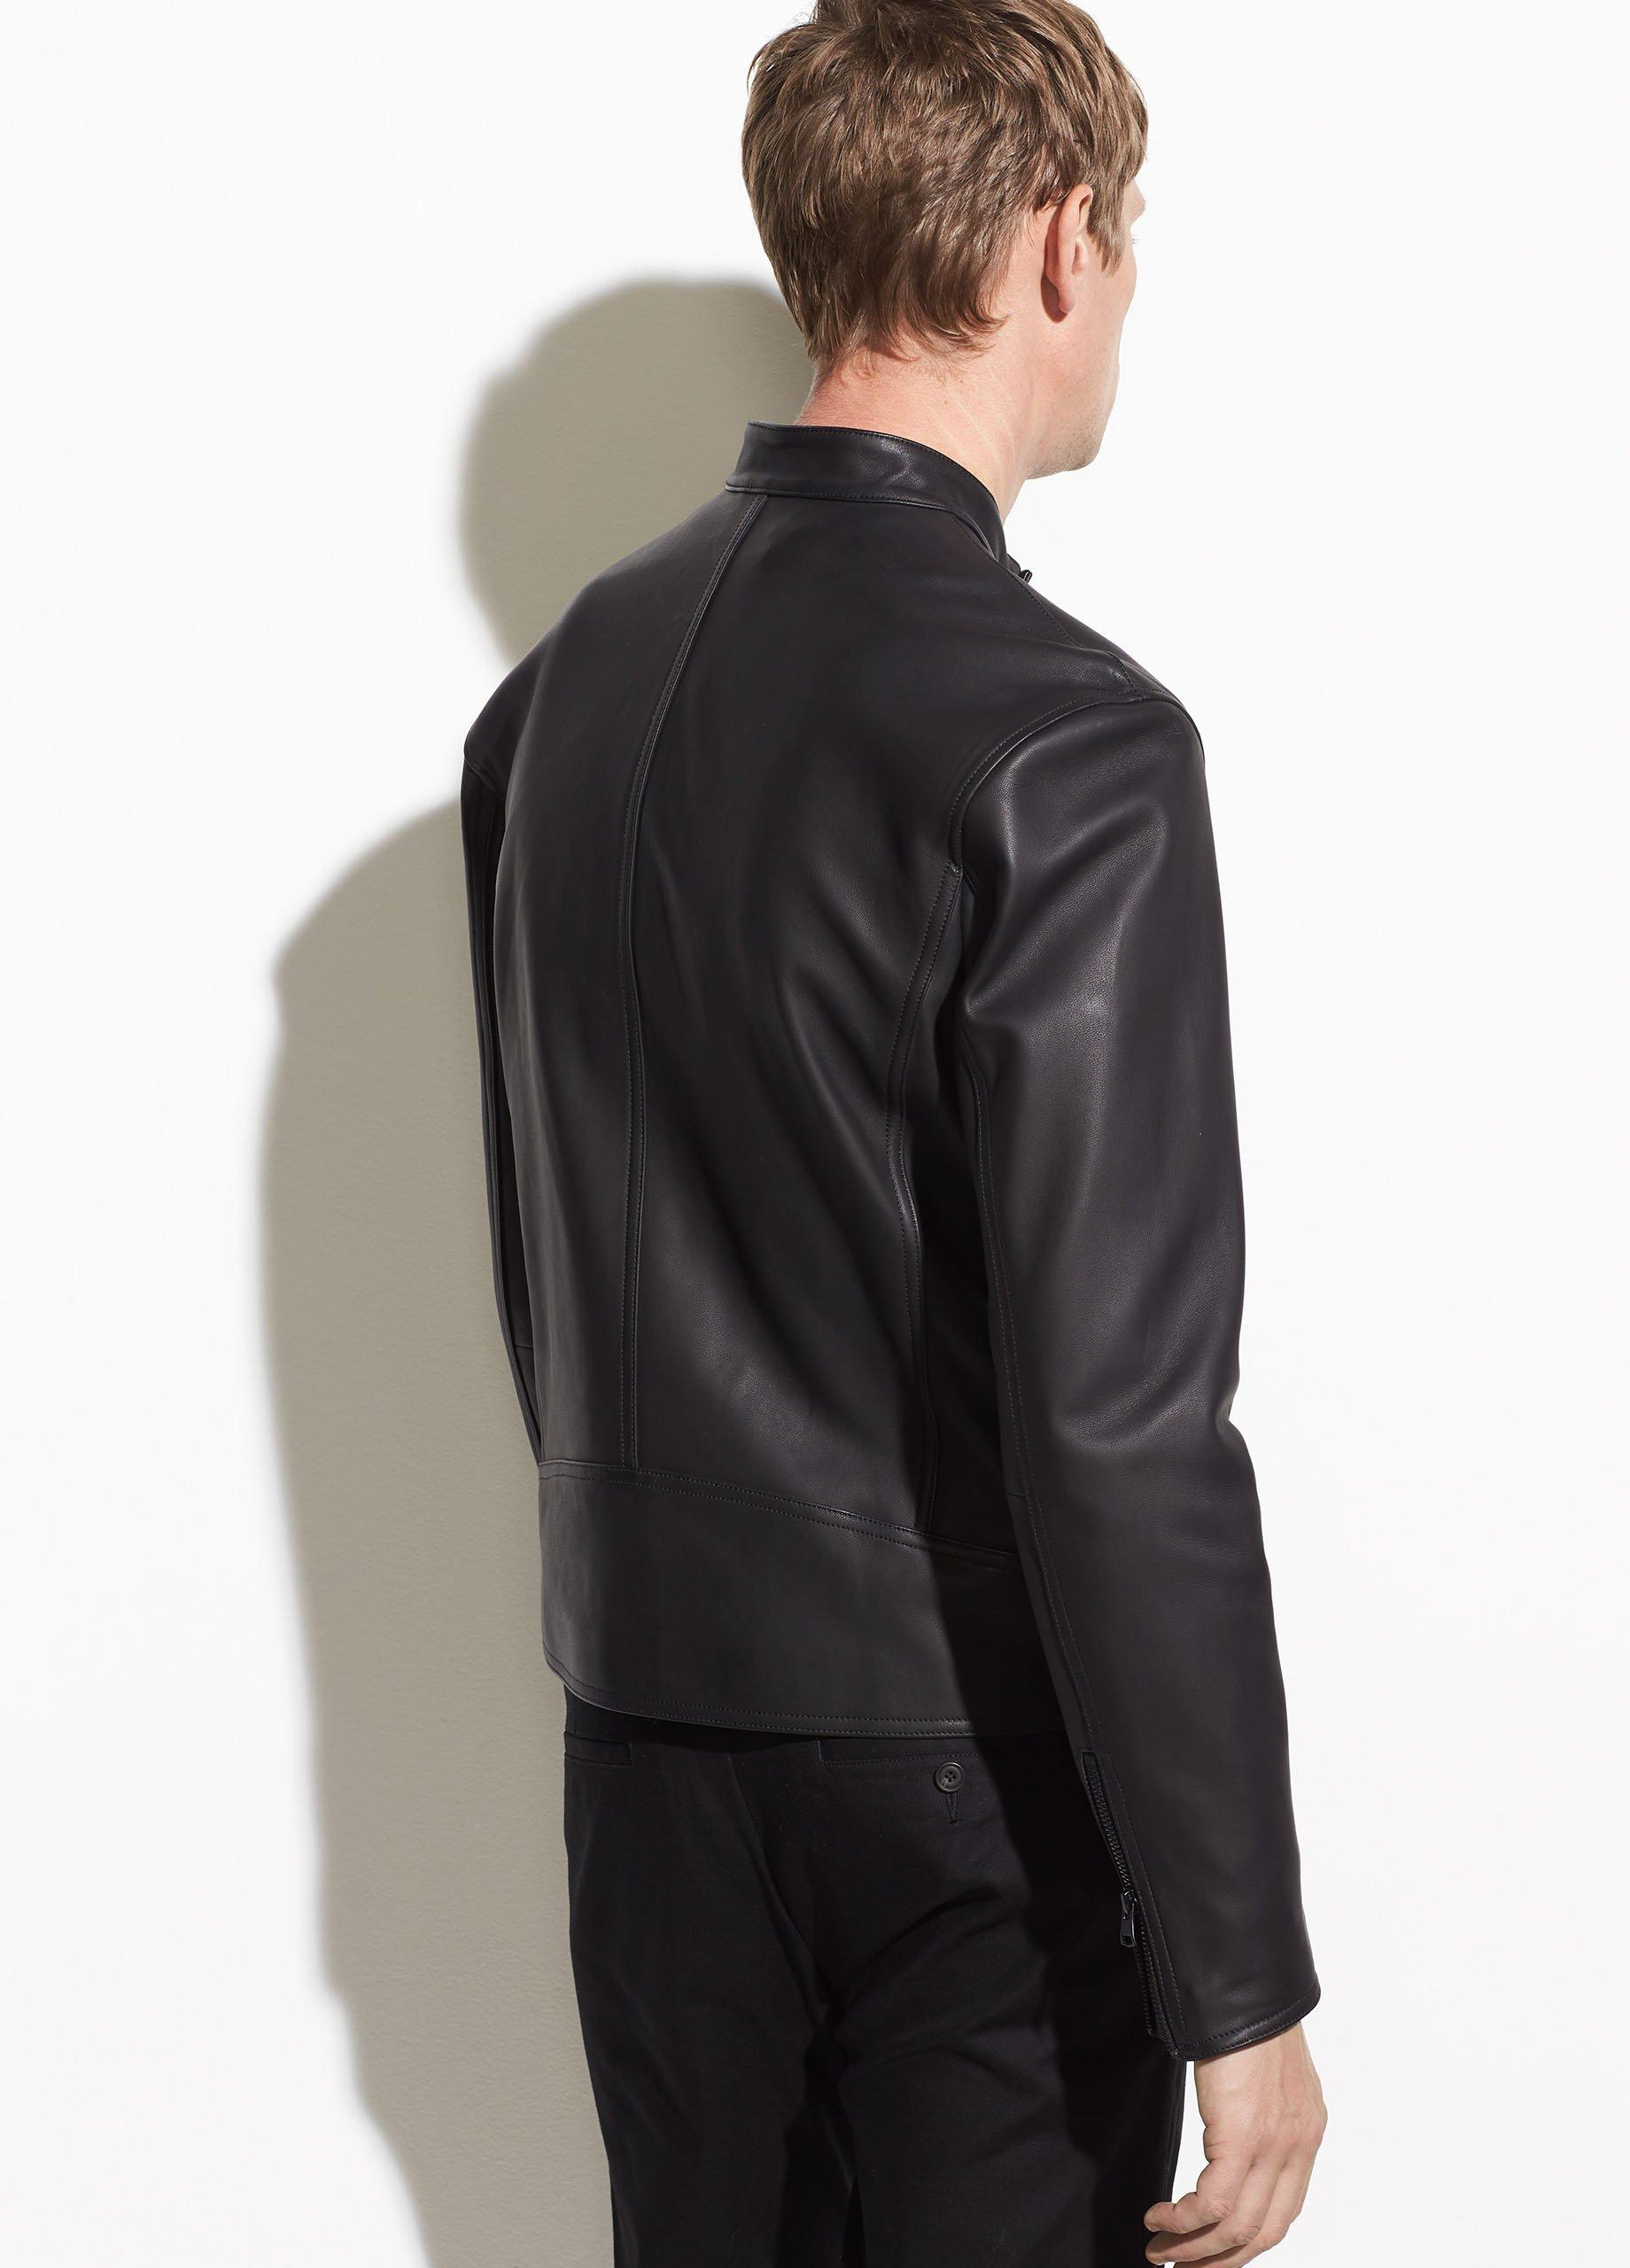 Leather Café Racer Jacket